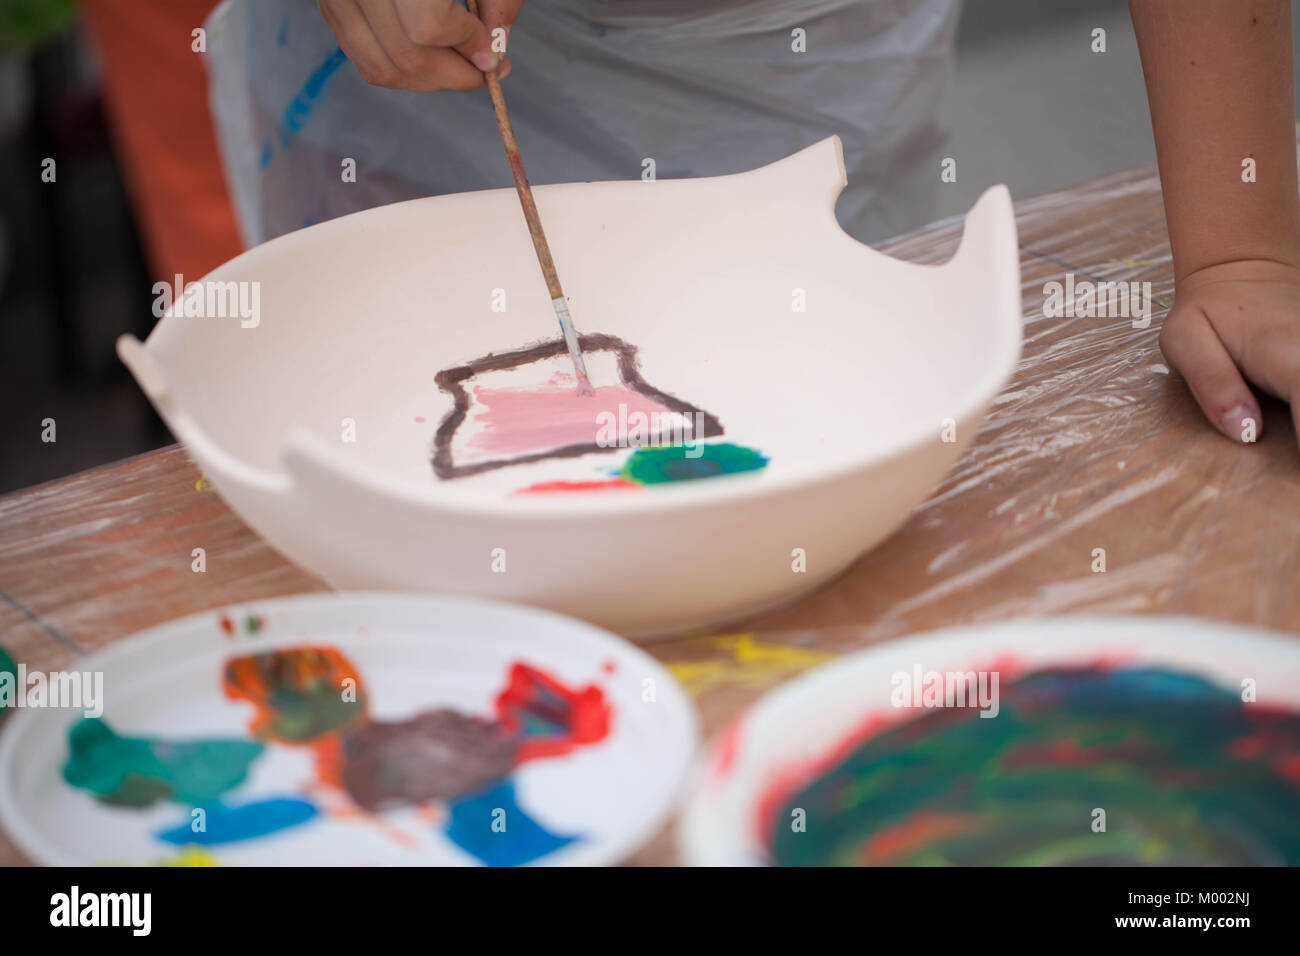 Ceramic Painting Craft Dishes Stock Photos